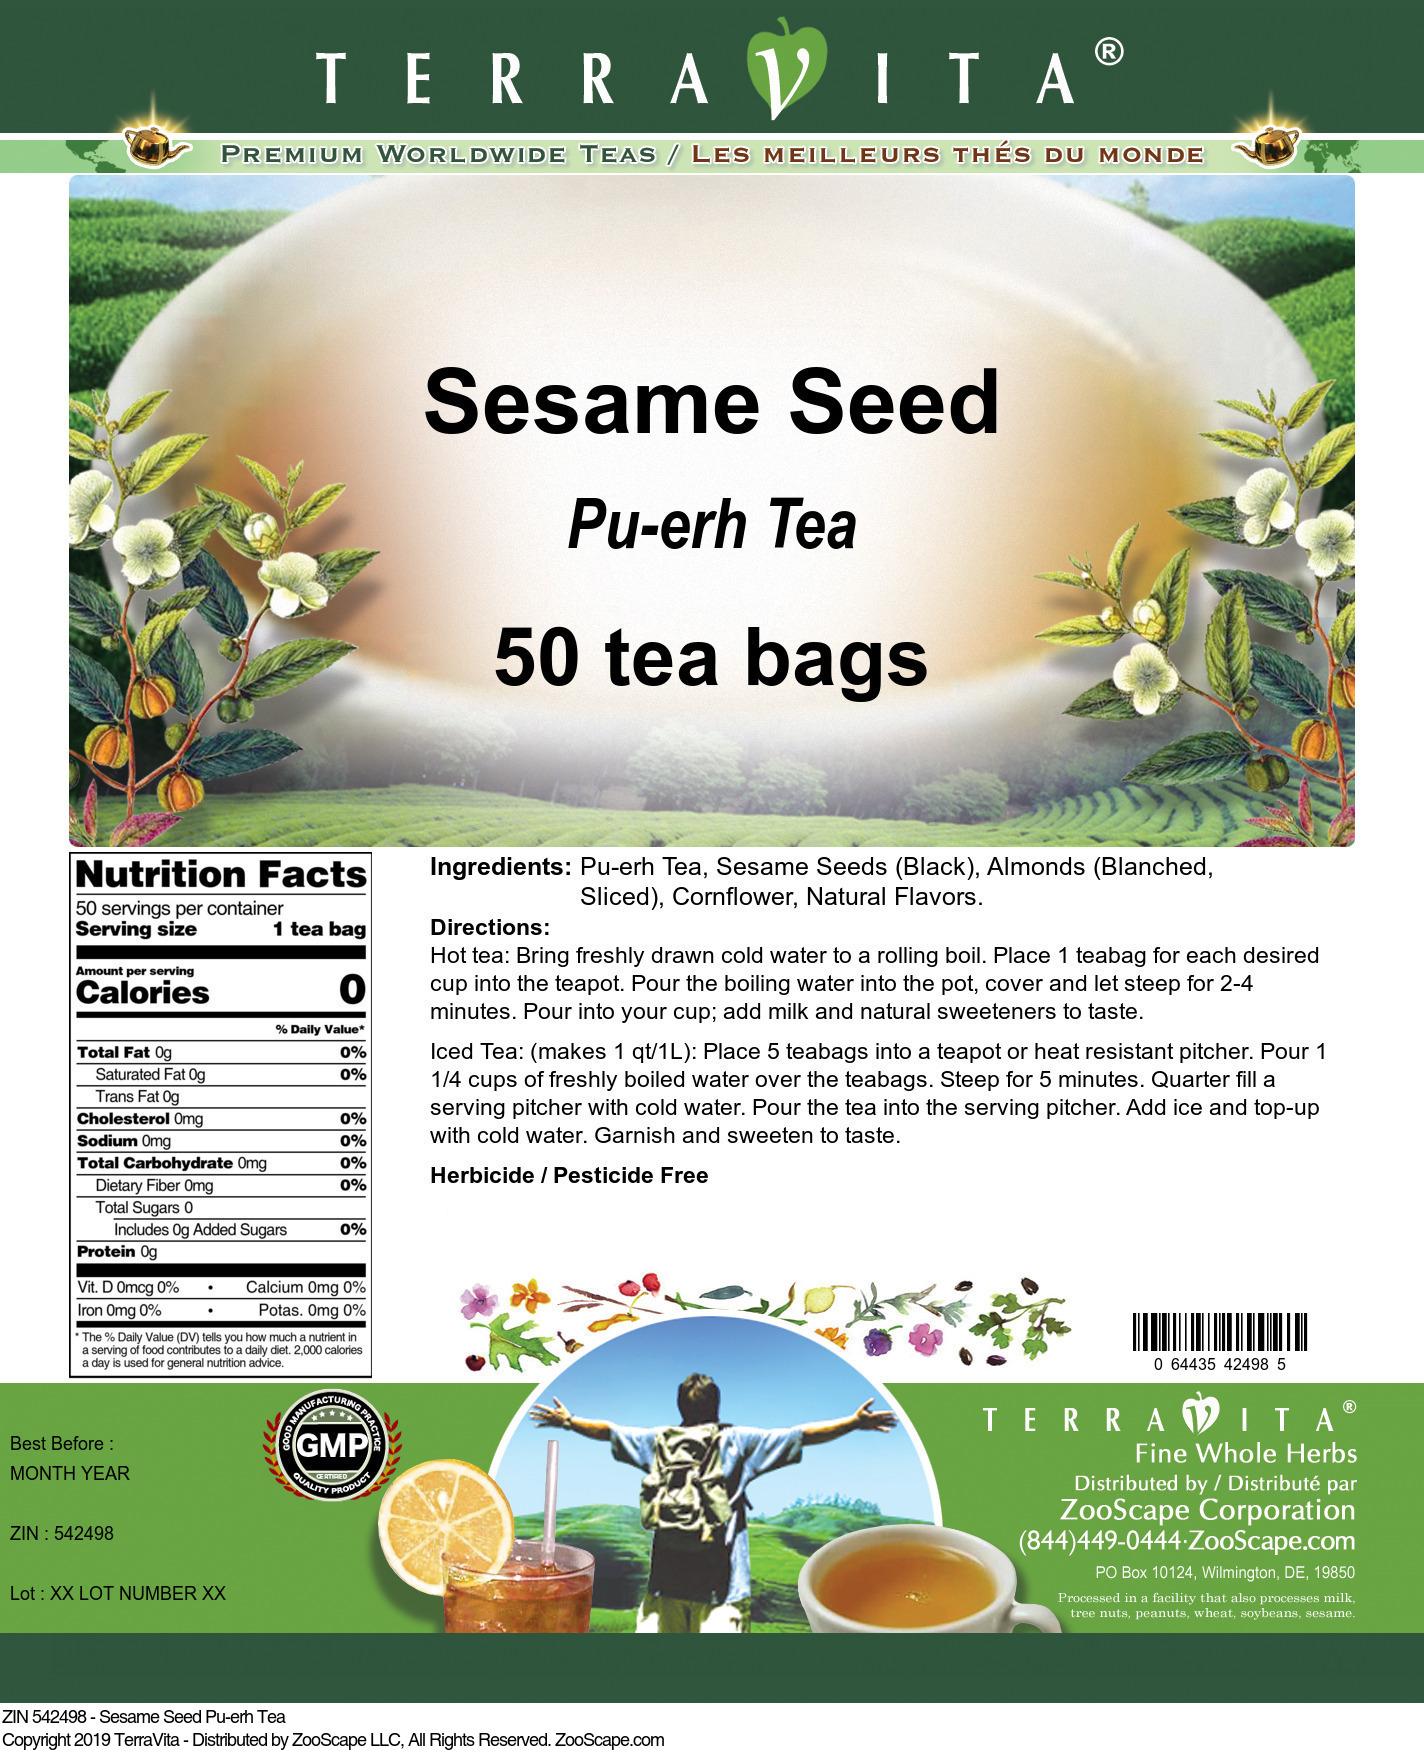 Sesame Seed Pu-erh Tea